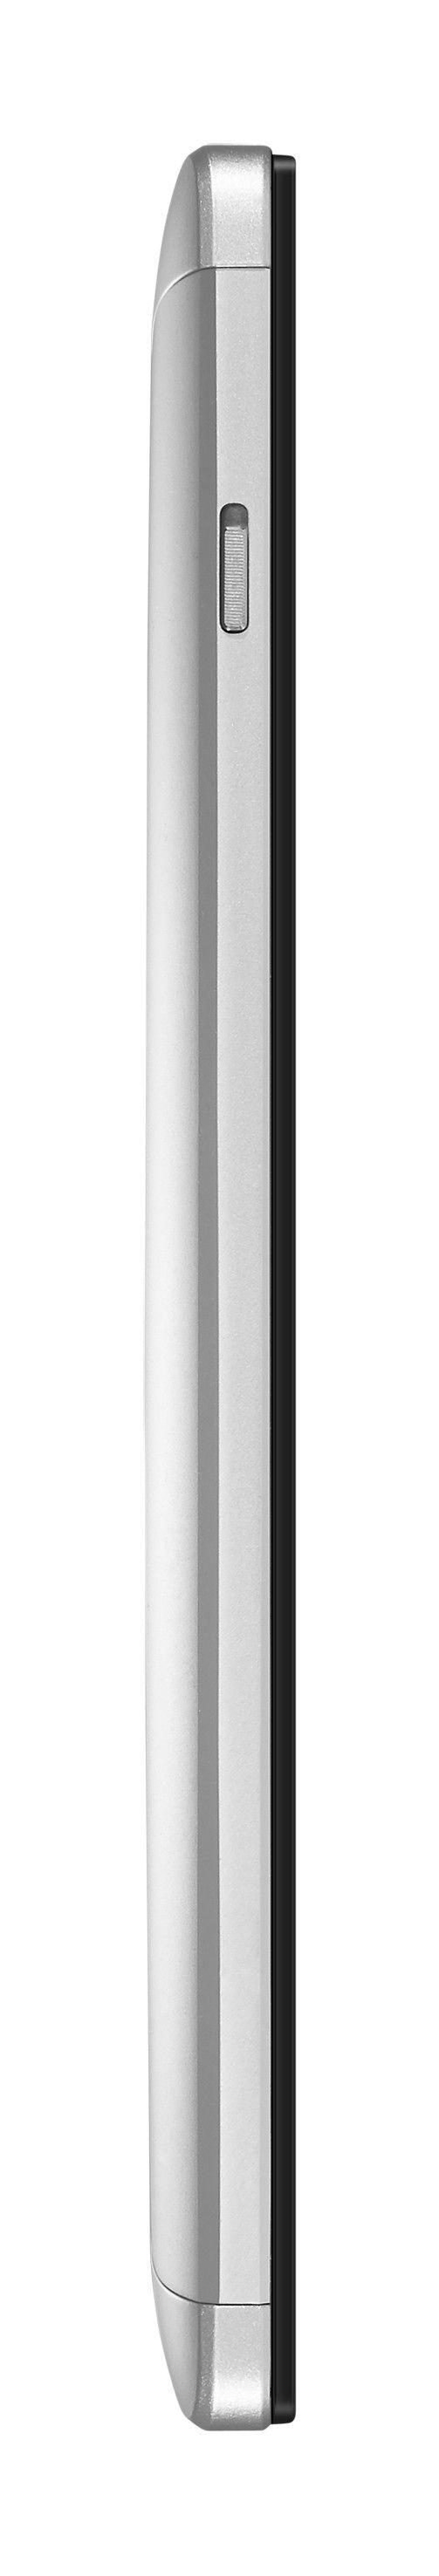 Мобильный телефон Lenovo VIBE P1 Pro Silver - 4